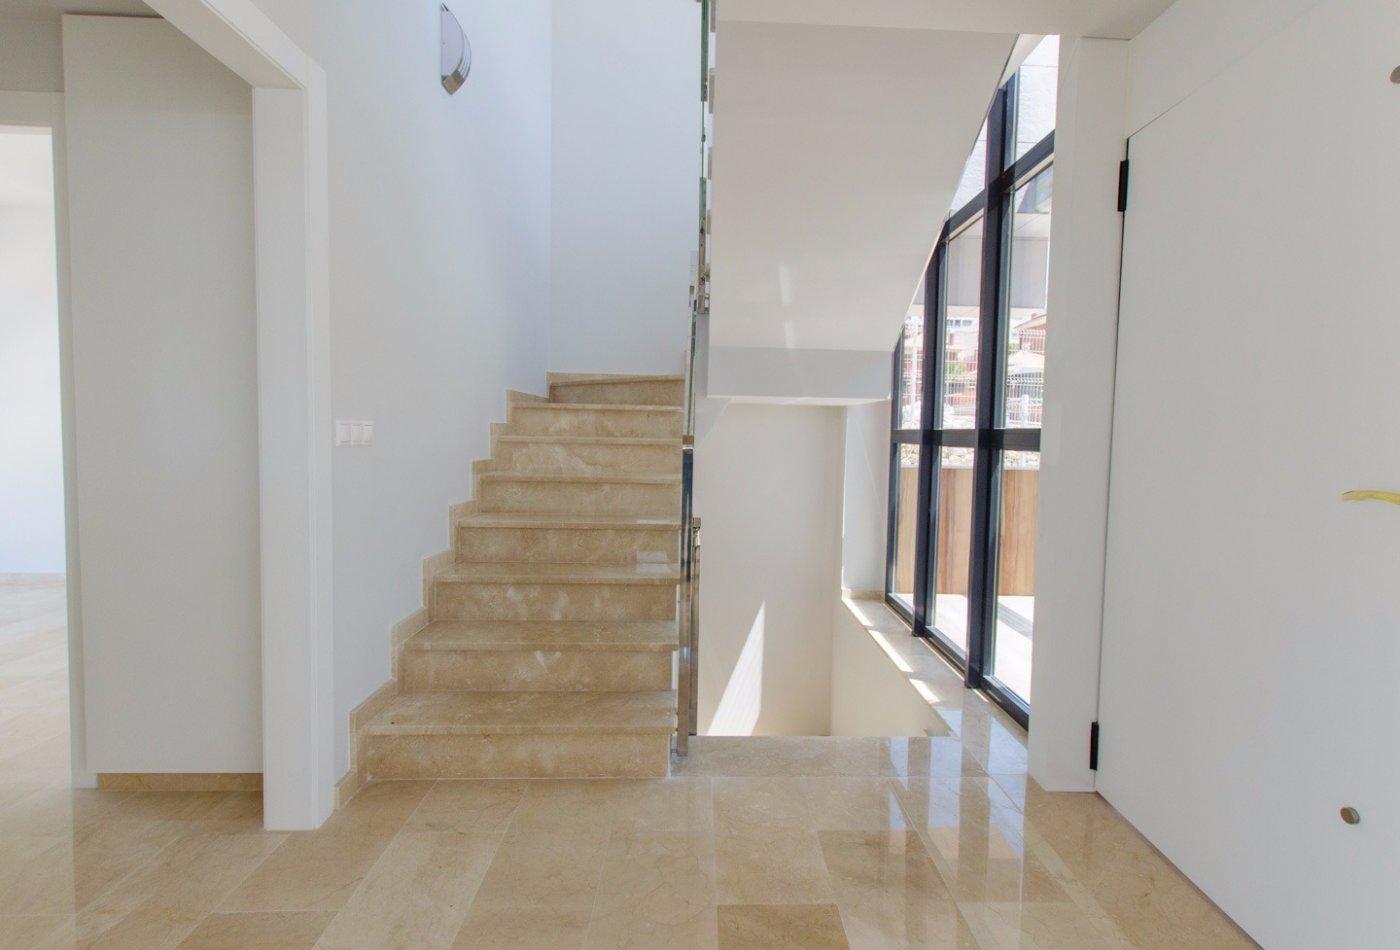 Villas modernas en balcÓn de finestrat a un paso de benidorm!!! - imagenInmueble28